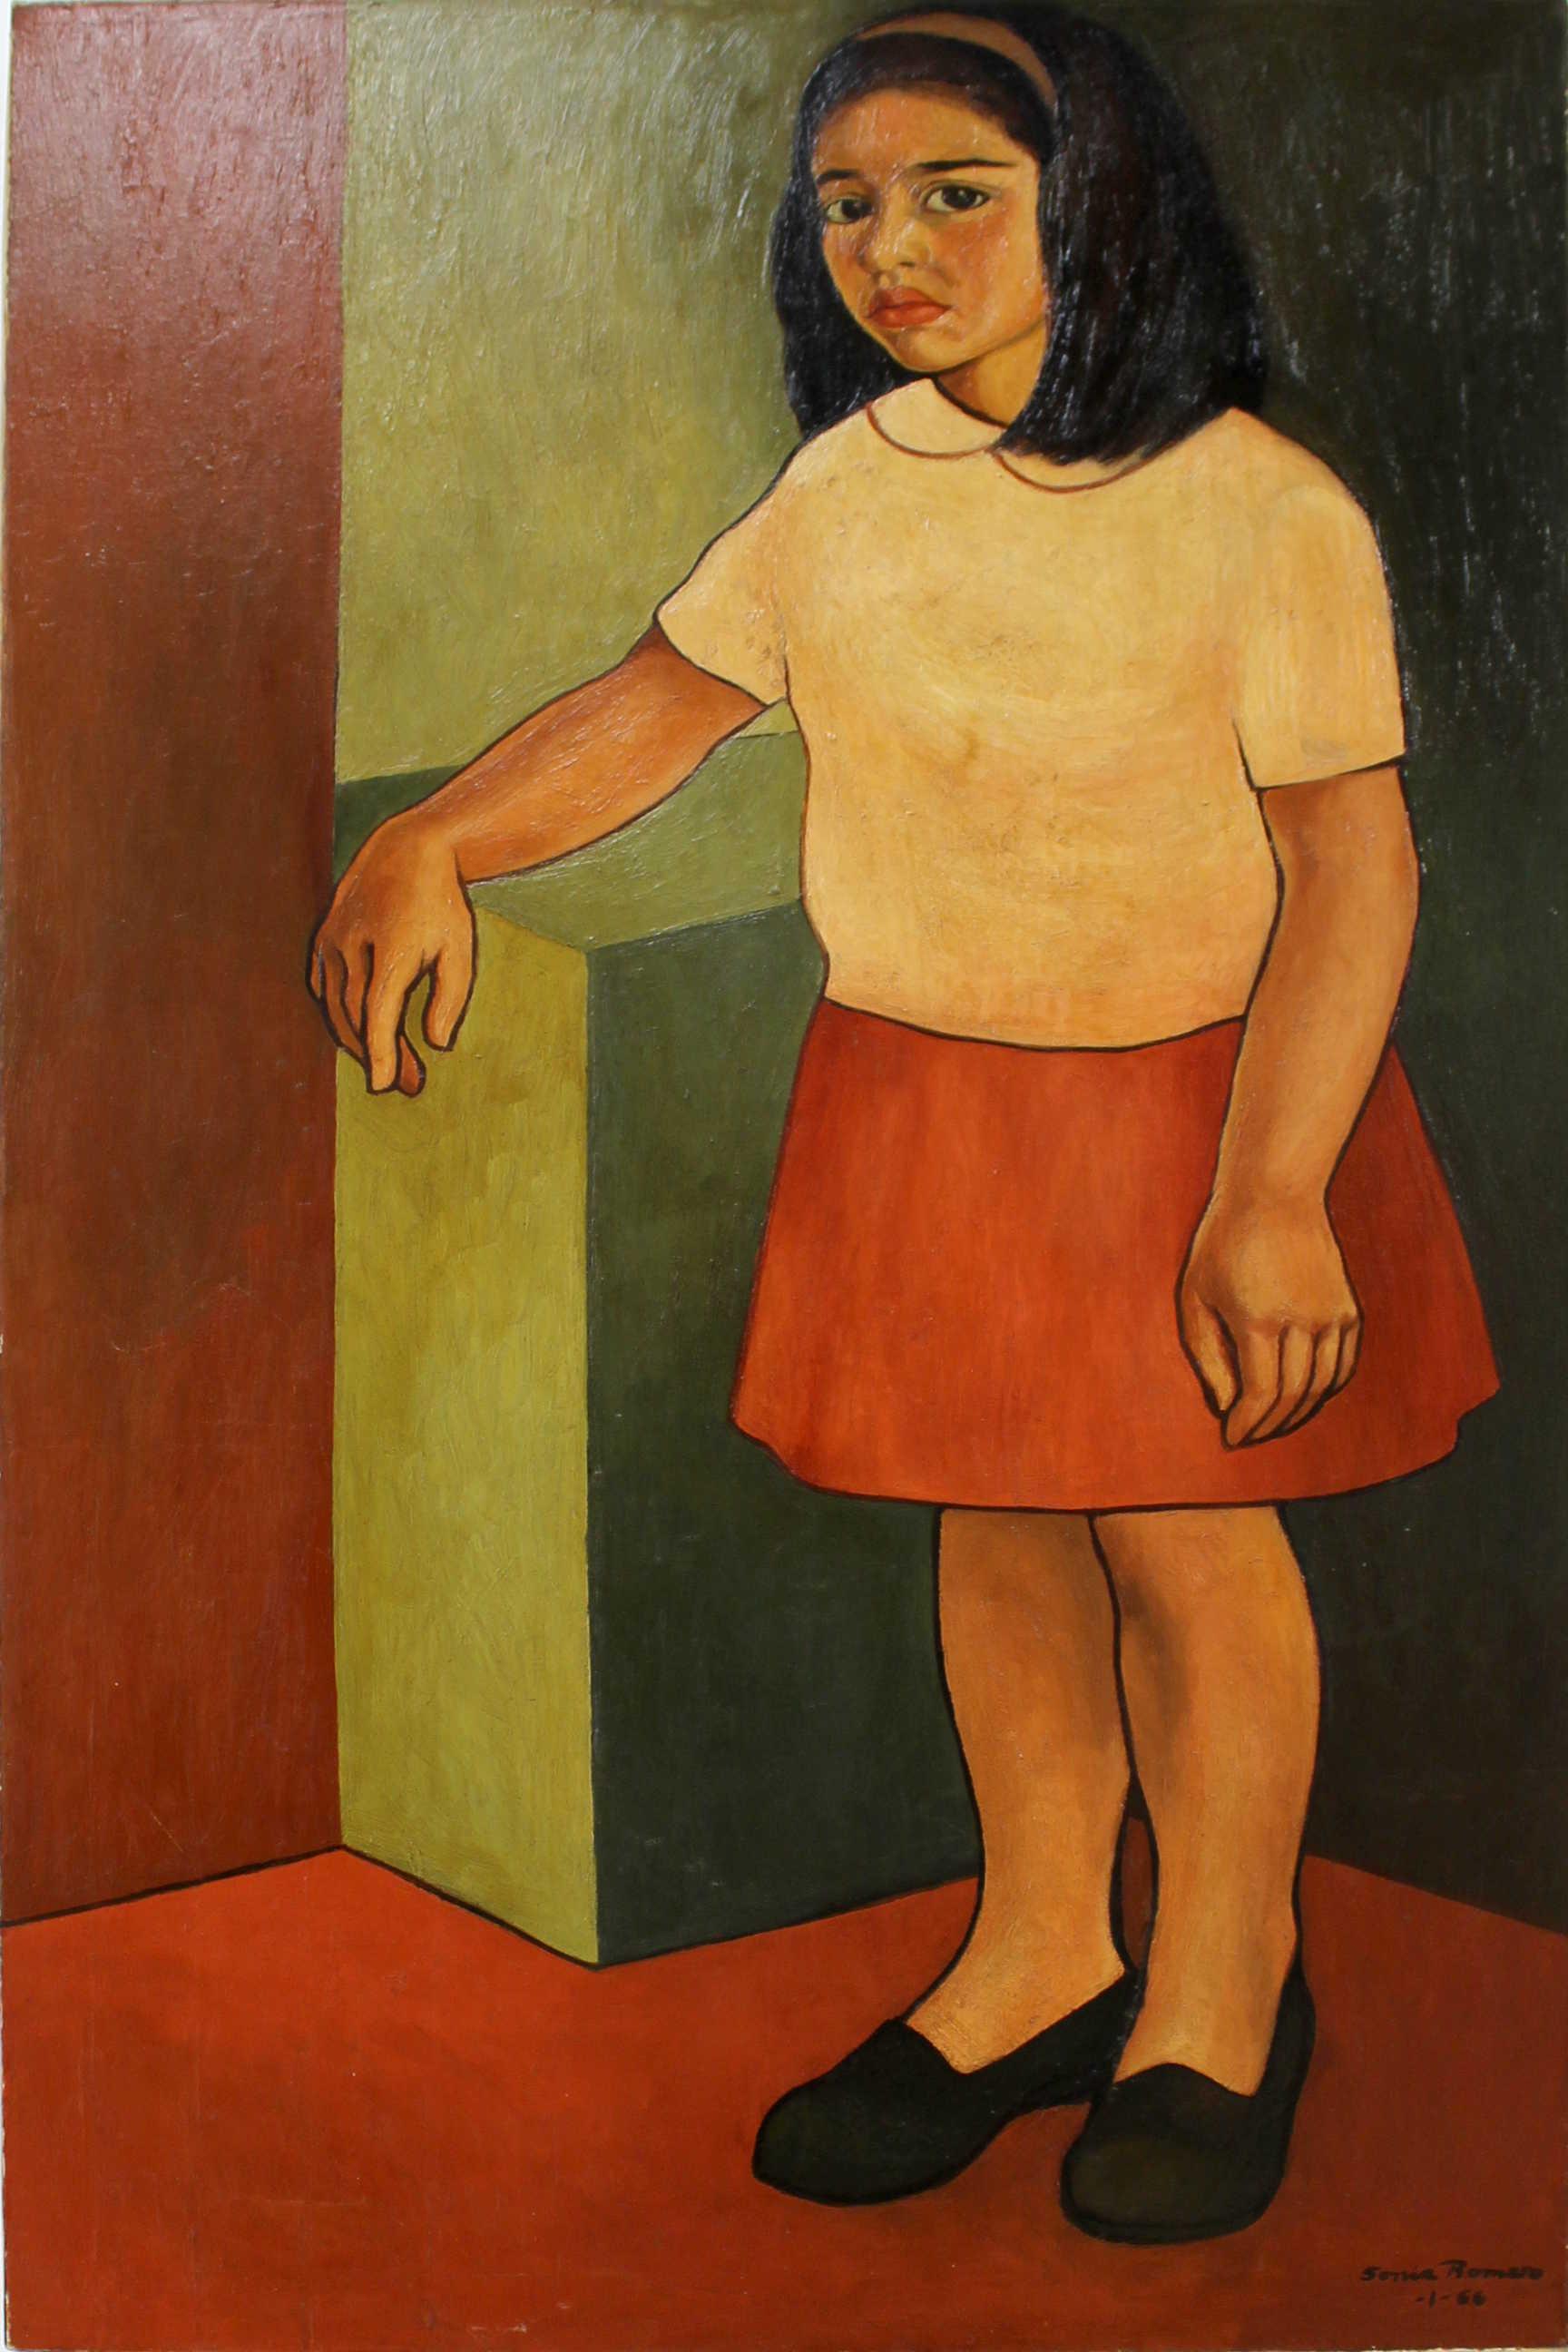 Obra de Sonia Romero Carmona, retrato de Floria Benavides Romero, óleo, año 1964. Fotografía: Adriana Araya.